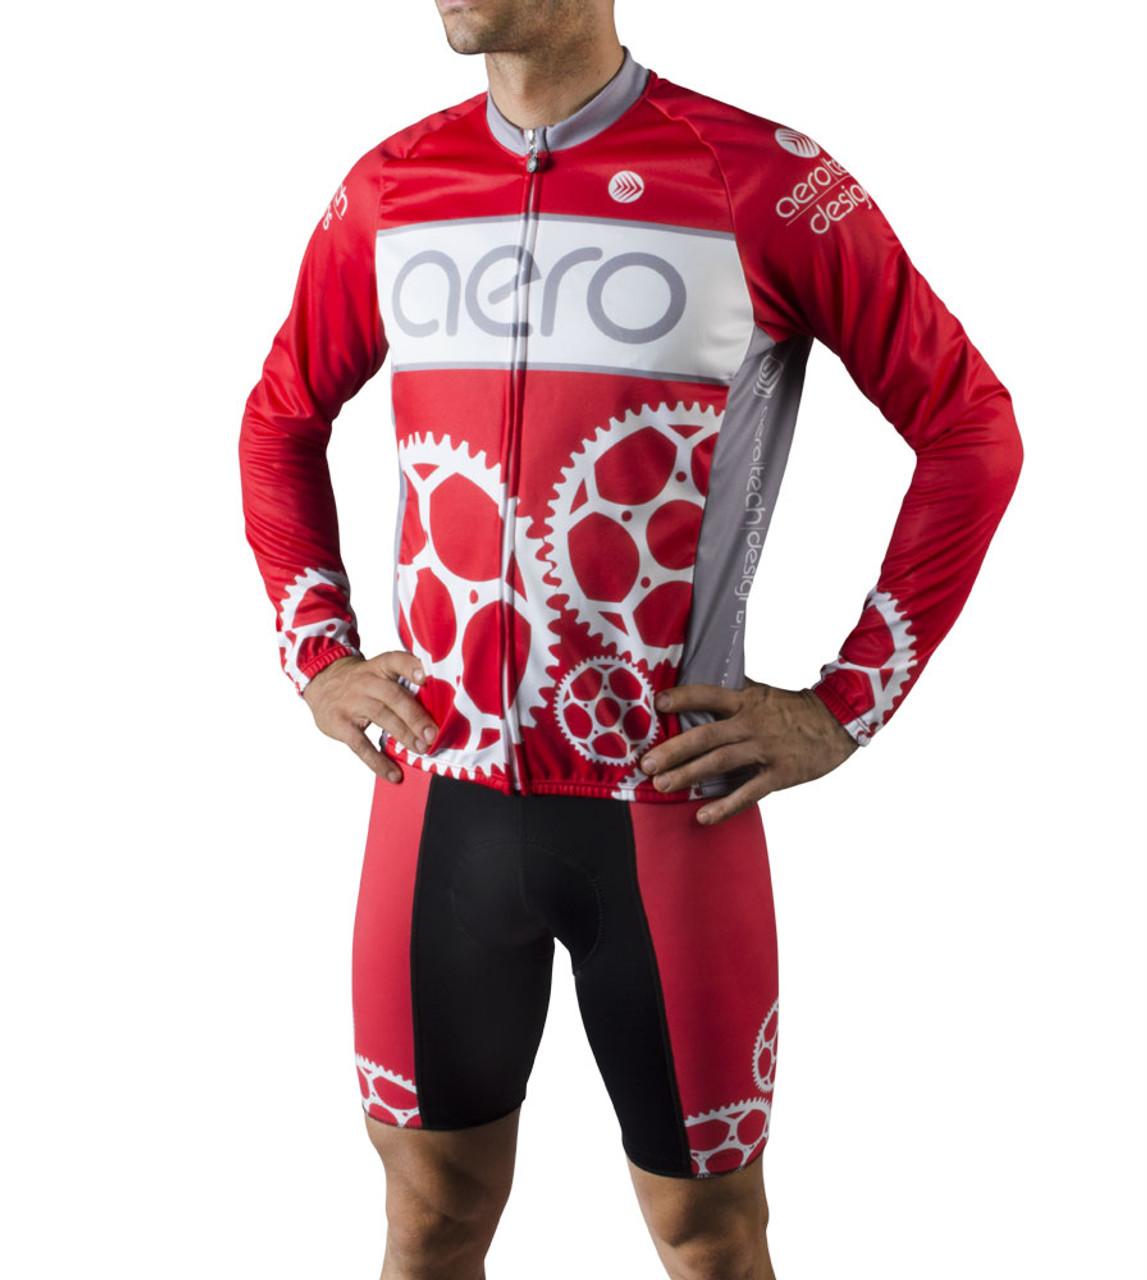 Aero Tech Designs Long Sleeve Eyes On The Road Halloween Cycling Bike Jersey